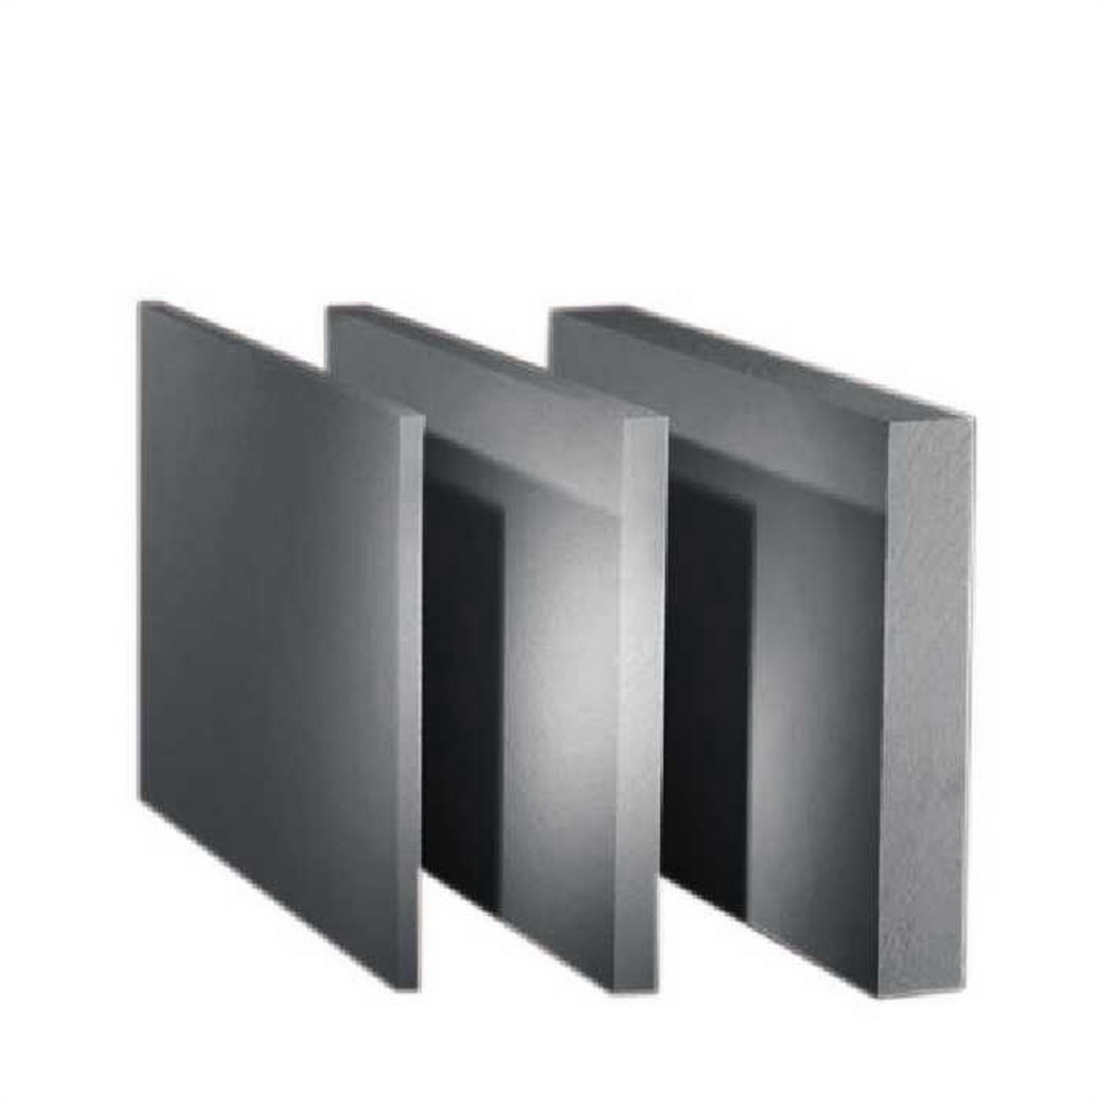 Expol Platinum Board 2400 x 1200 x 65mm R2.03 Black Expanded Polystyrene N2465